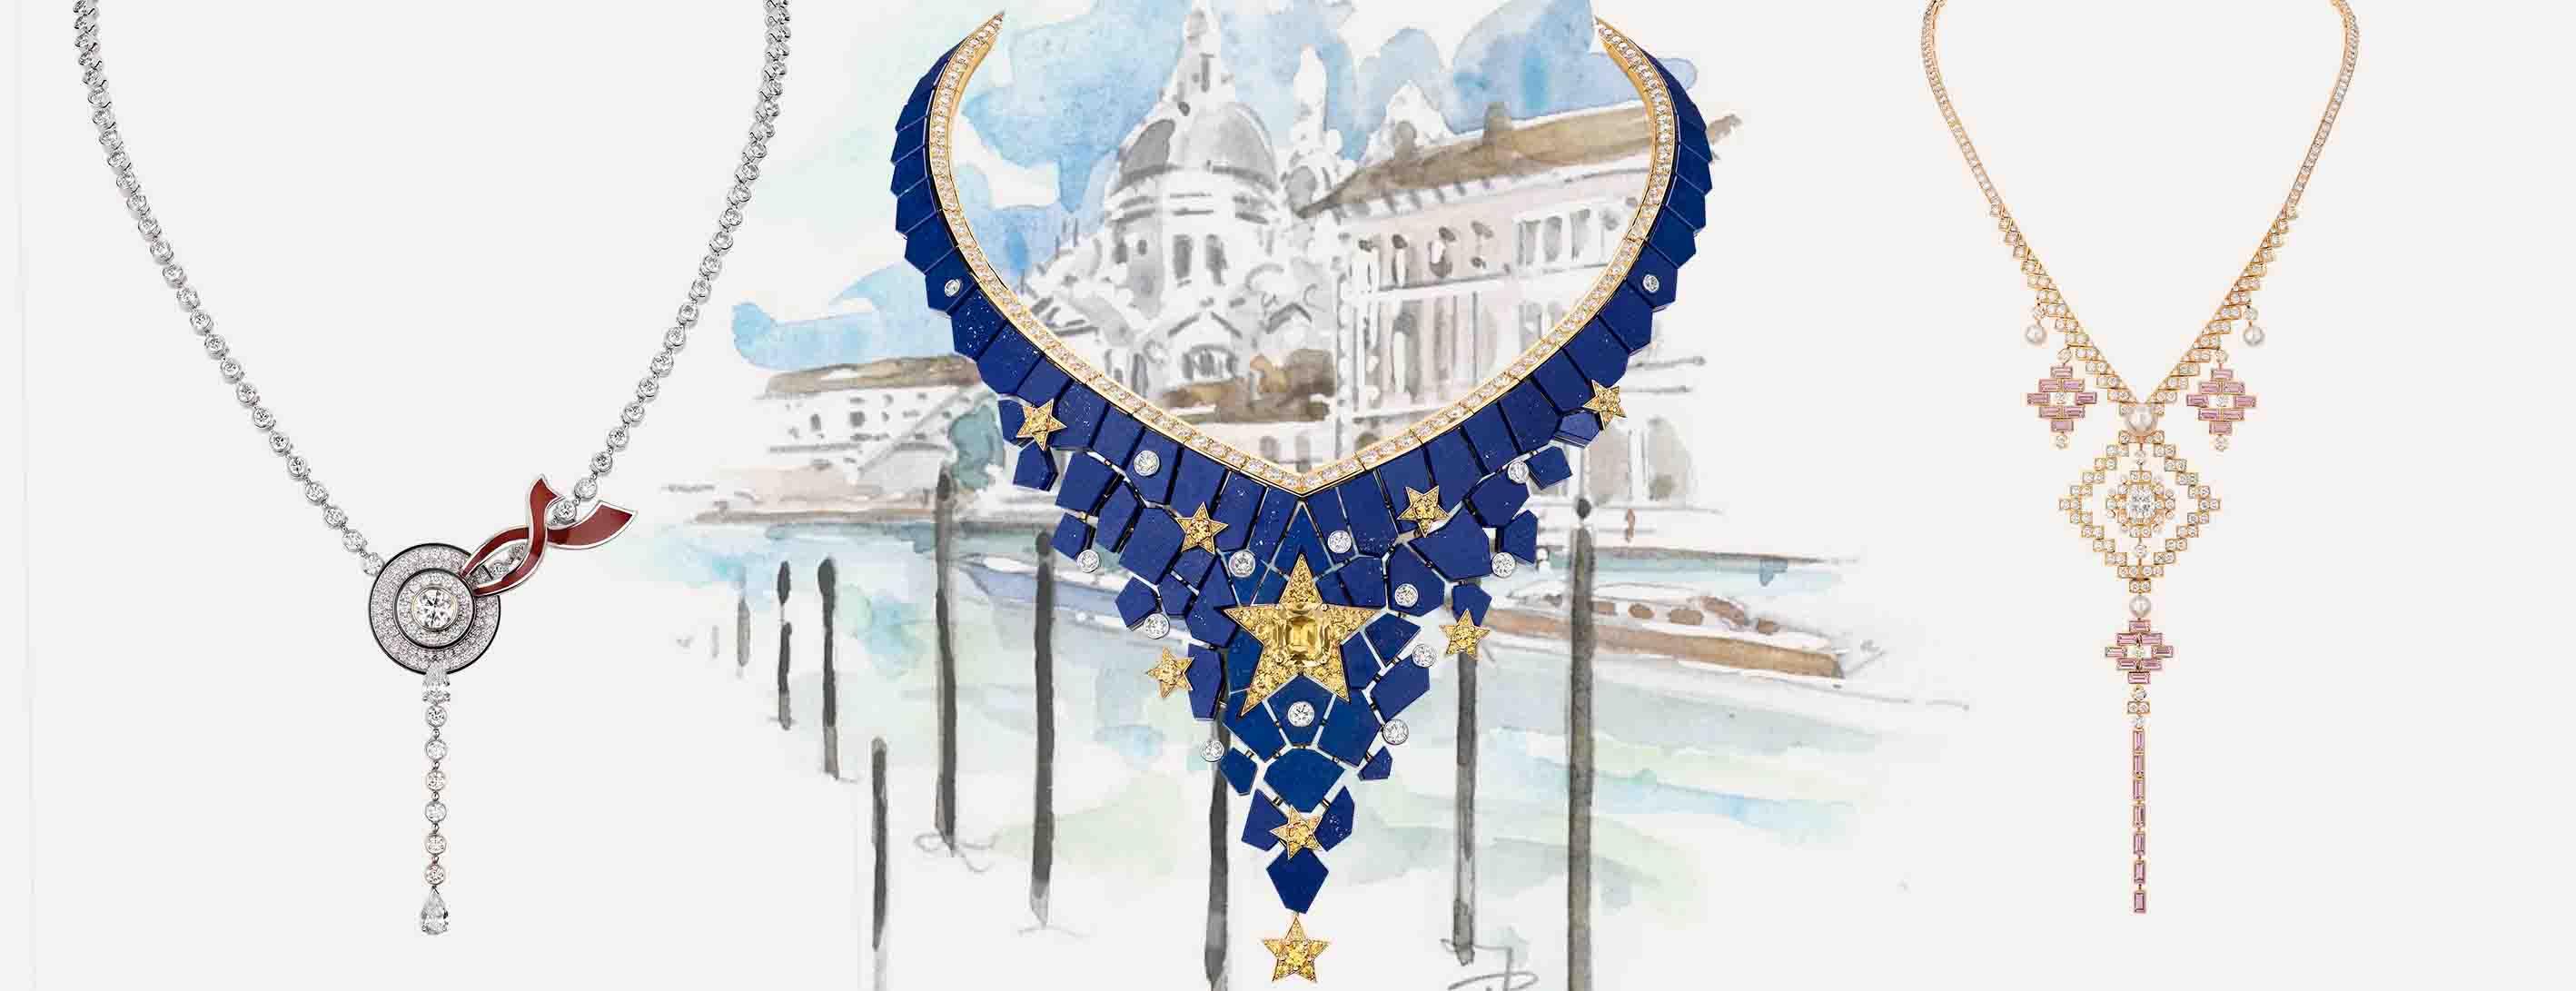 Chanel Escale à Venise high jewellery collection